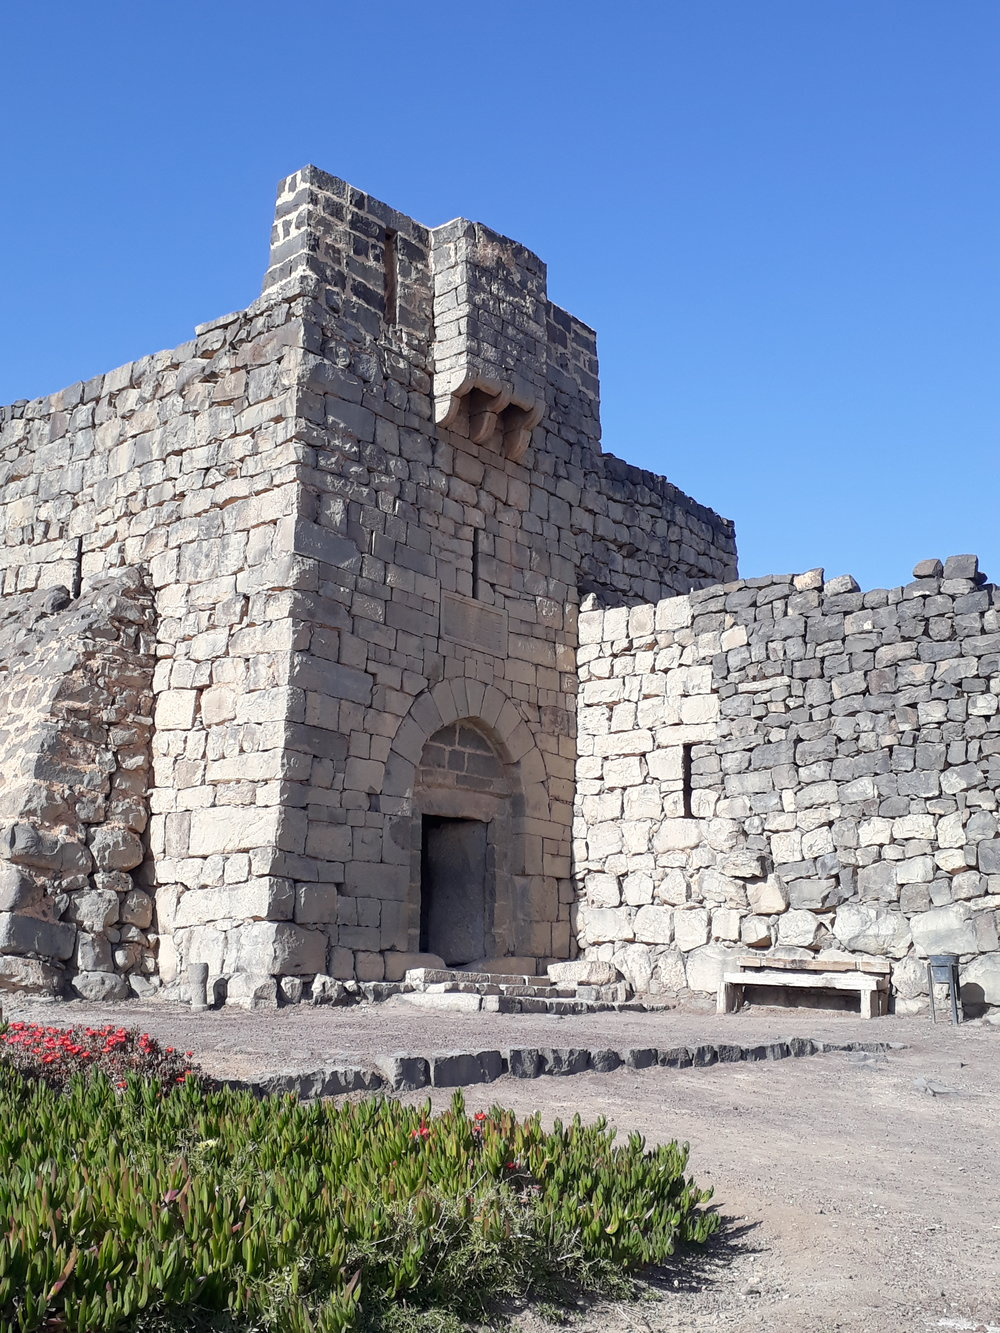 Entrance to Azraq Castle